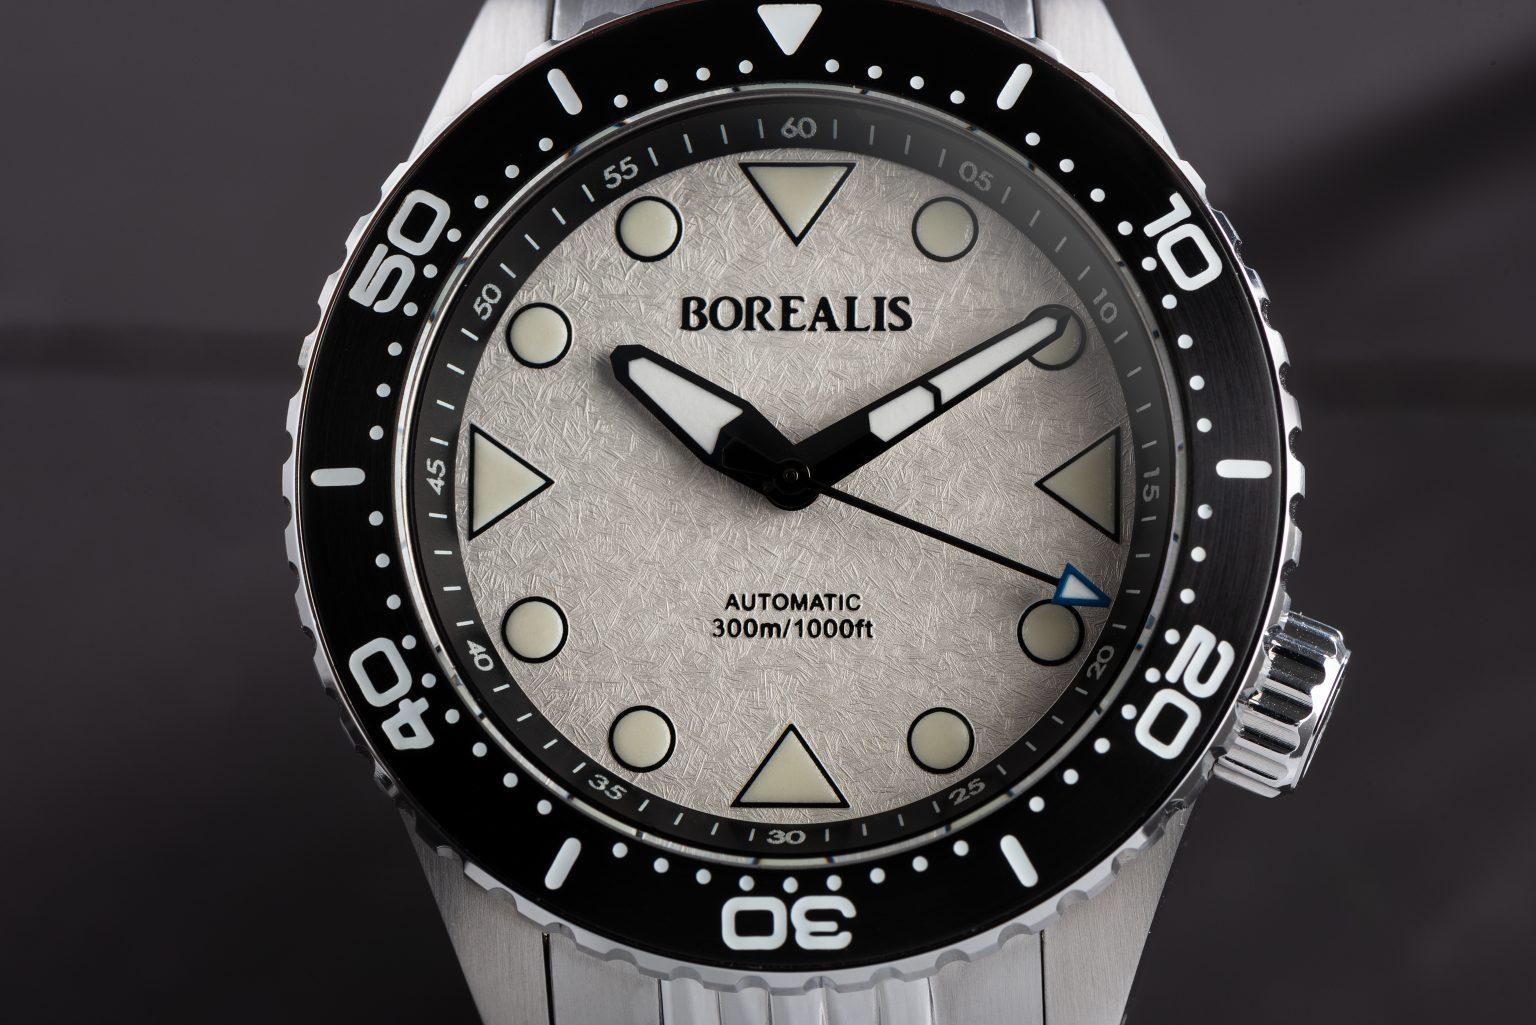 Borealis Neptuno, White Icy Frost, No Date